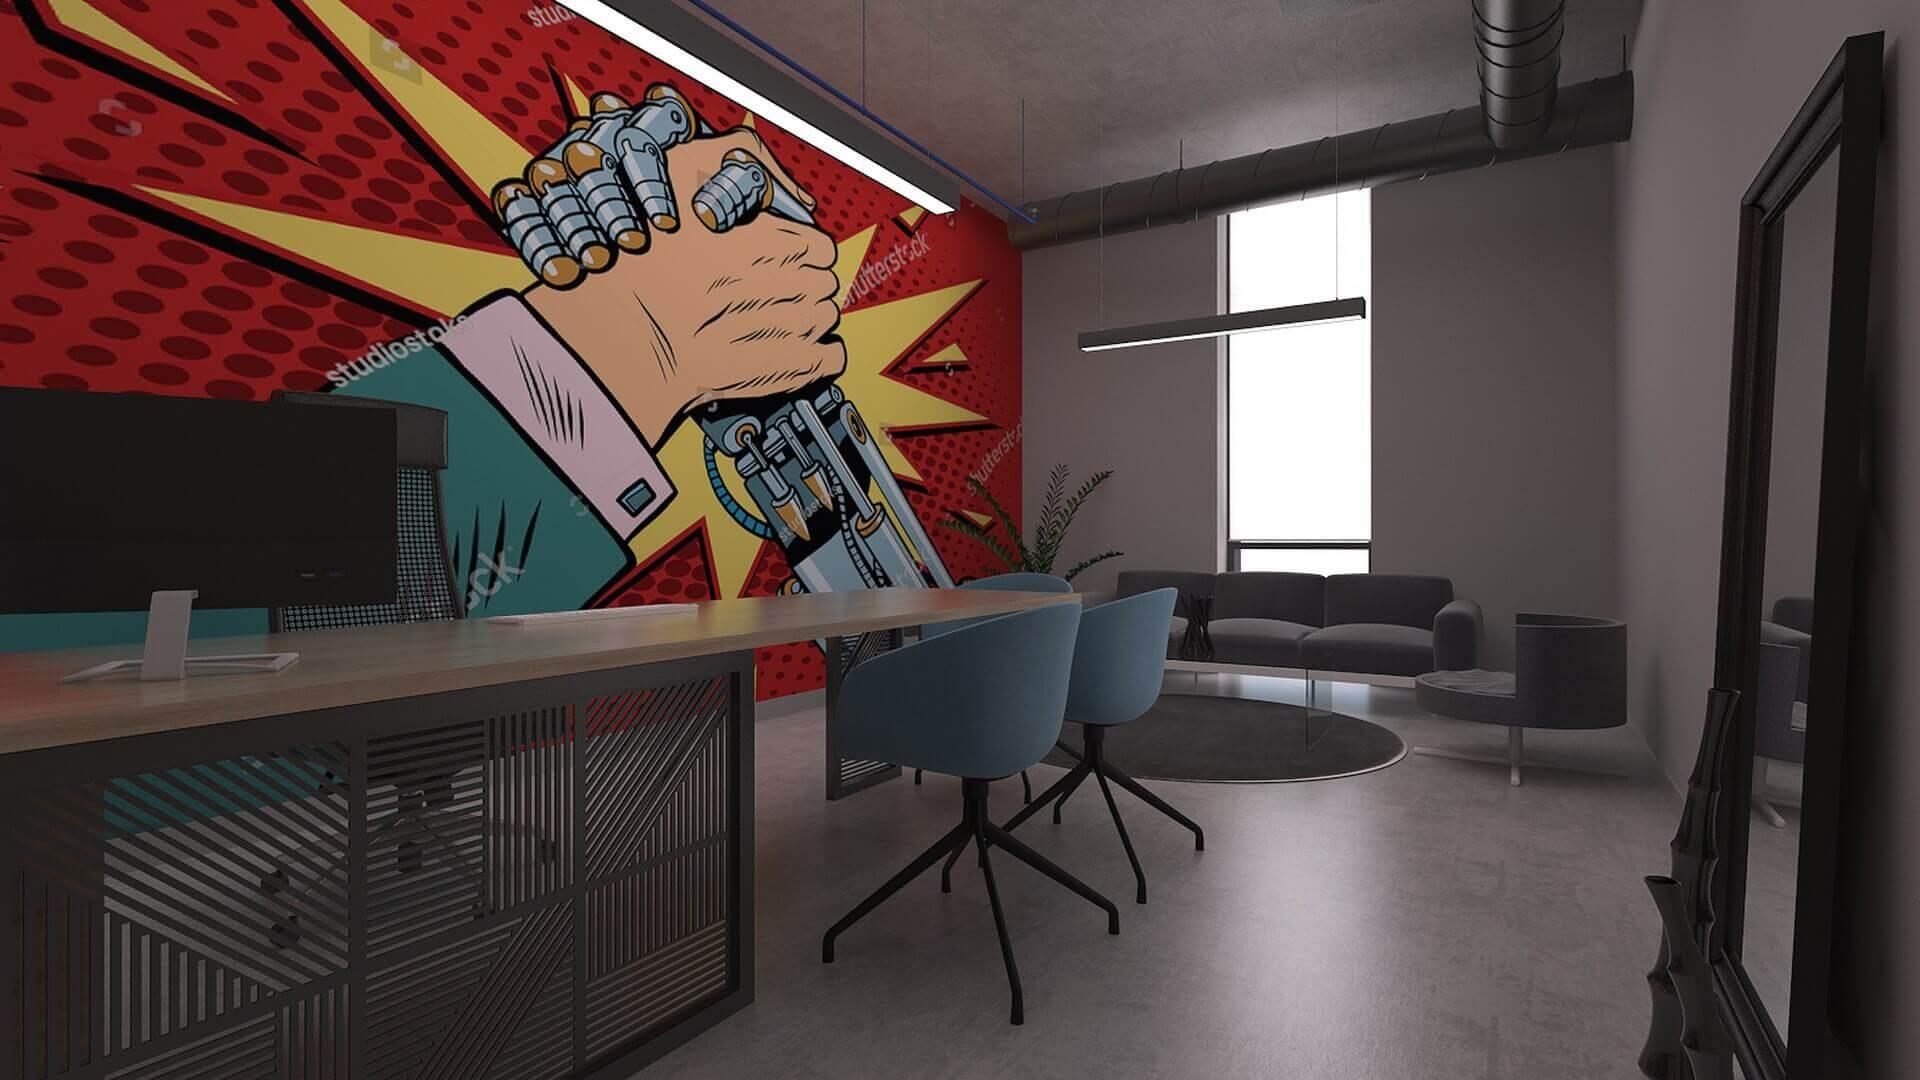 ofis içmimari 2337 Özel proje Ofisler